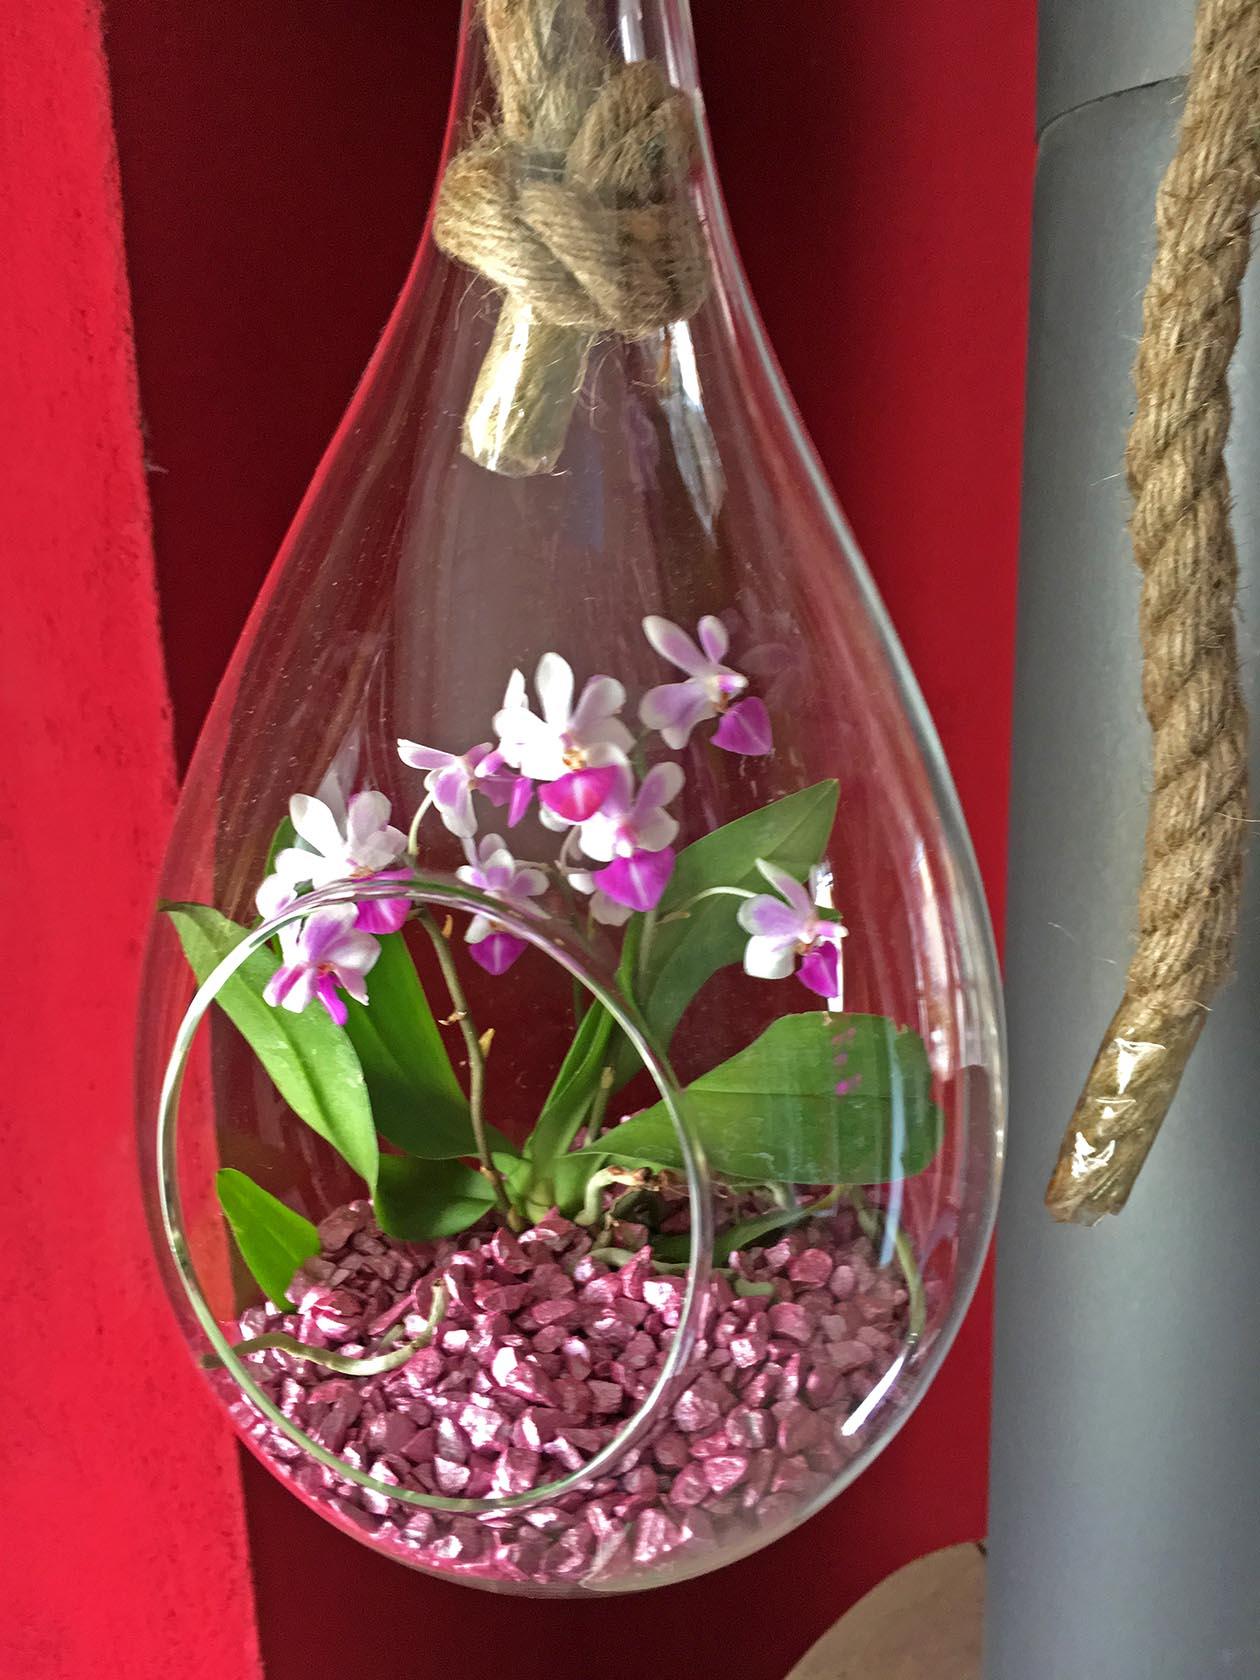 ... Vorschau: Colomi Orchideengranulat Gestaltungsidee ...